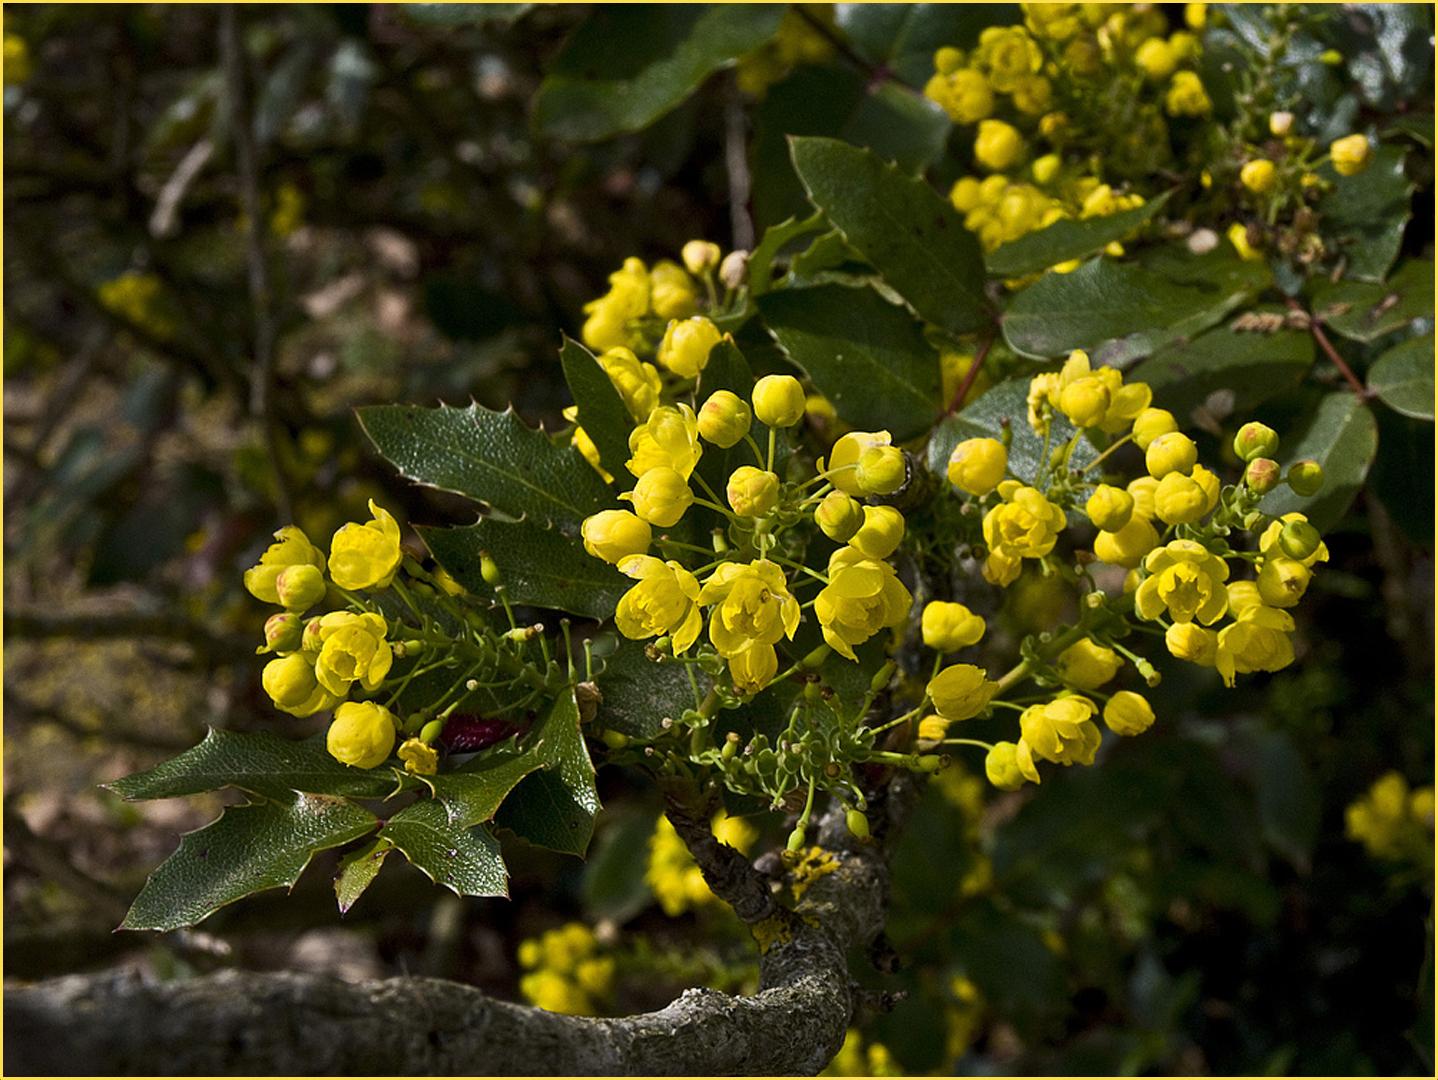 faux houx mahonia aquifolium gew hnliche mahonie photo et image divers la nature. Black Bedroom Furniture Sets. Home Design Ideas